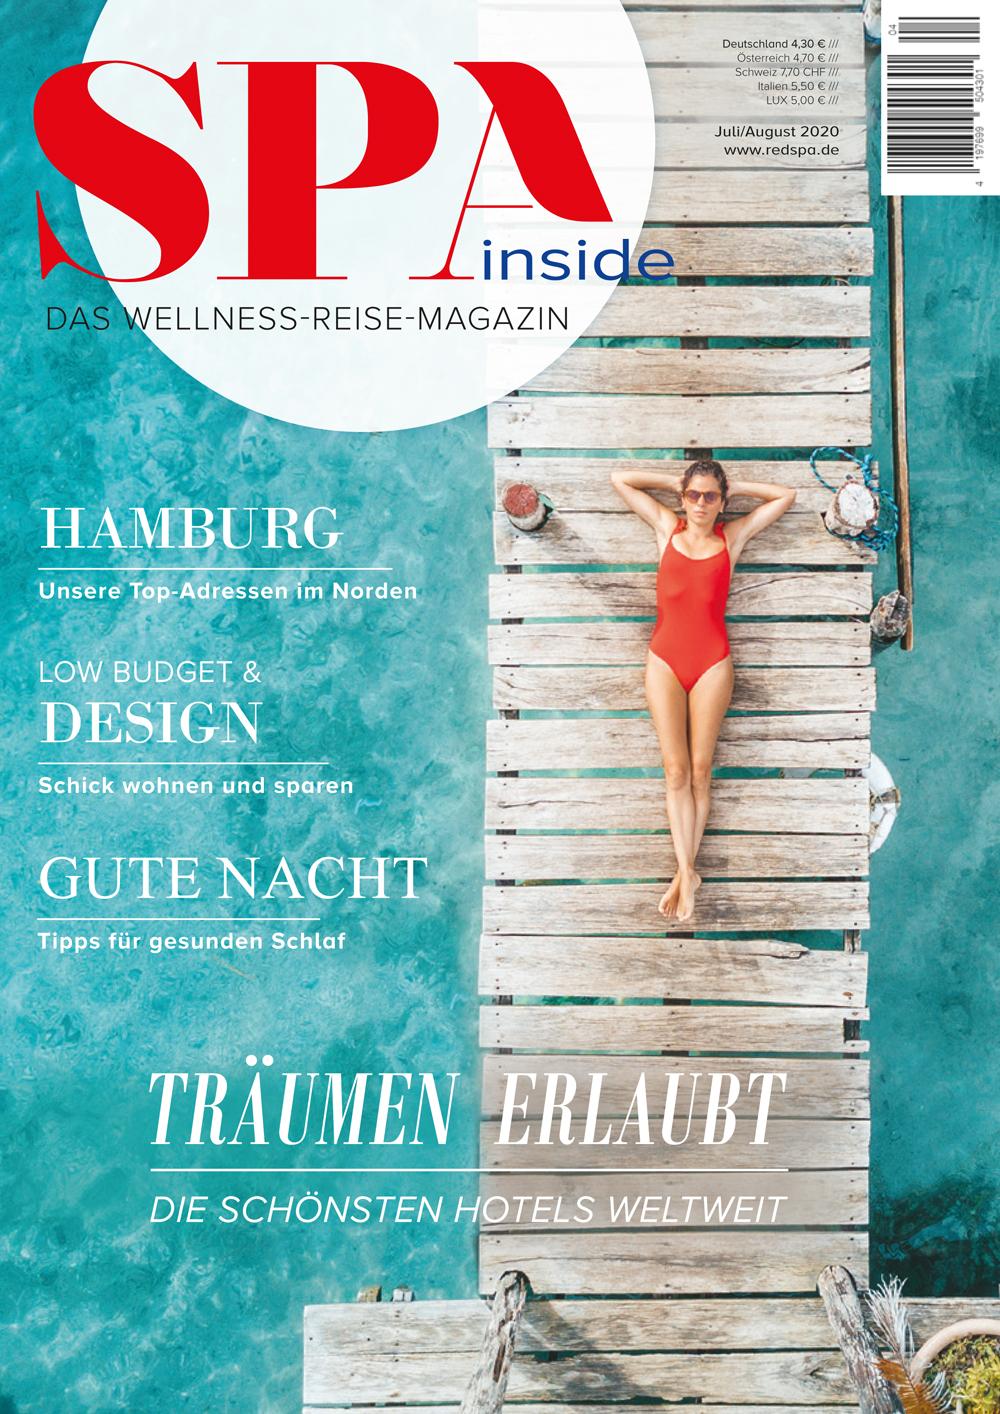 SPA inside - Ausgabe 04/2020